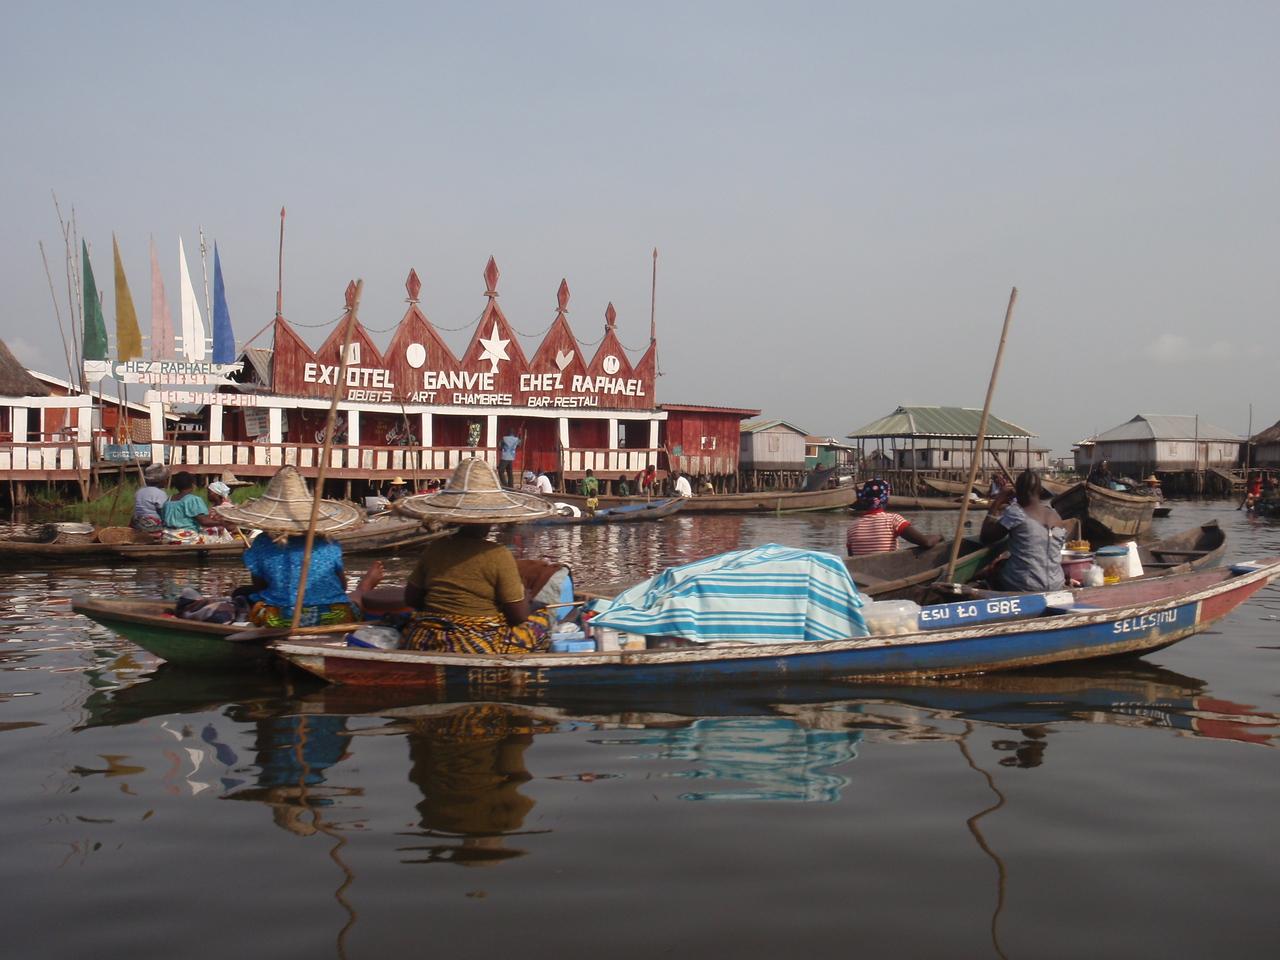 088_Ganvie Lake Community  Lake Nokoue  Small Floating Markets